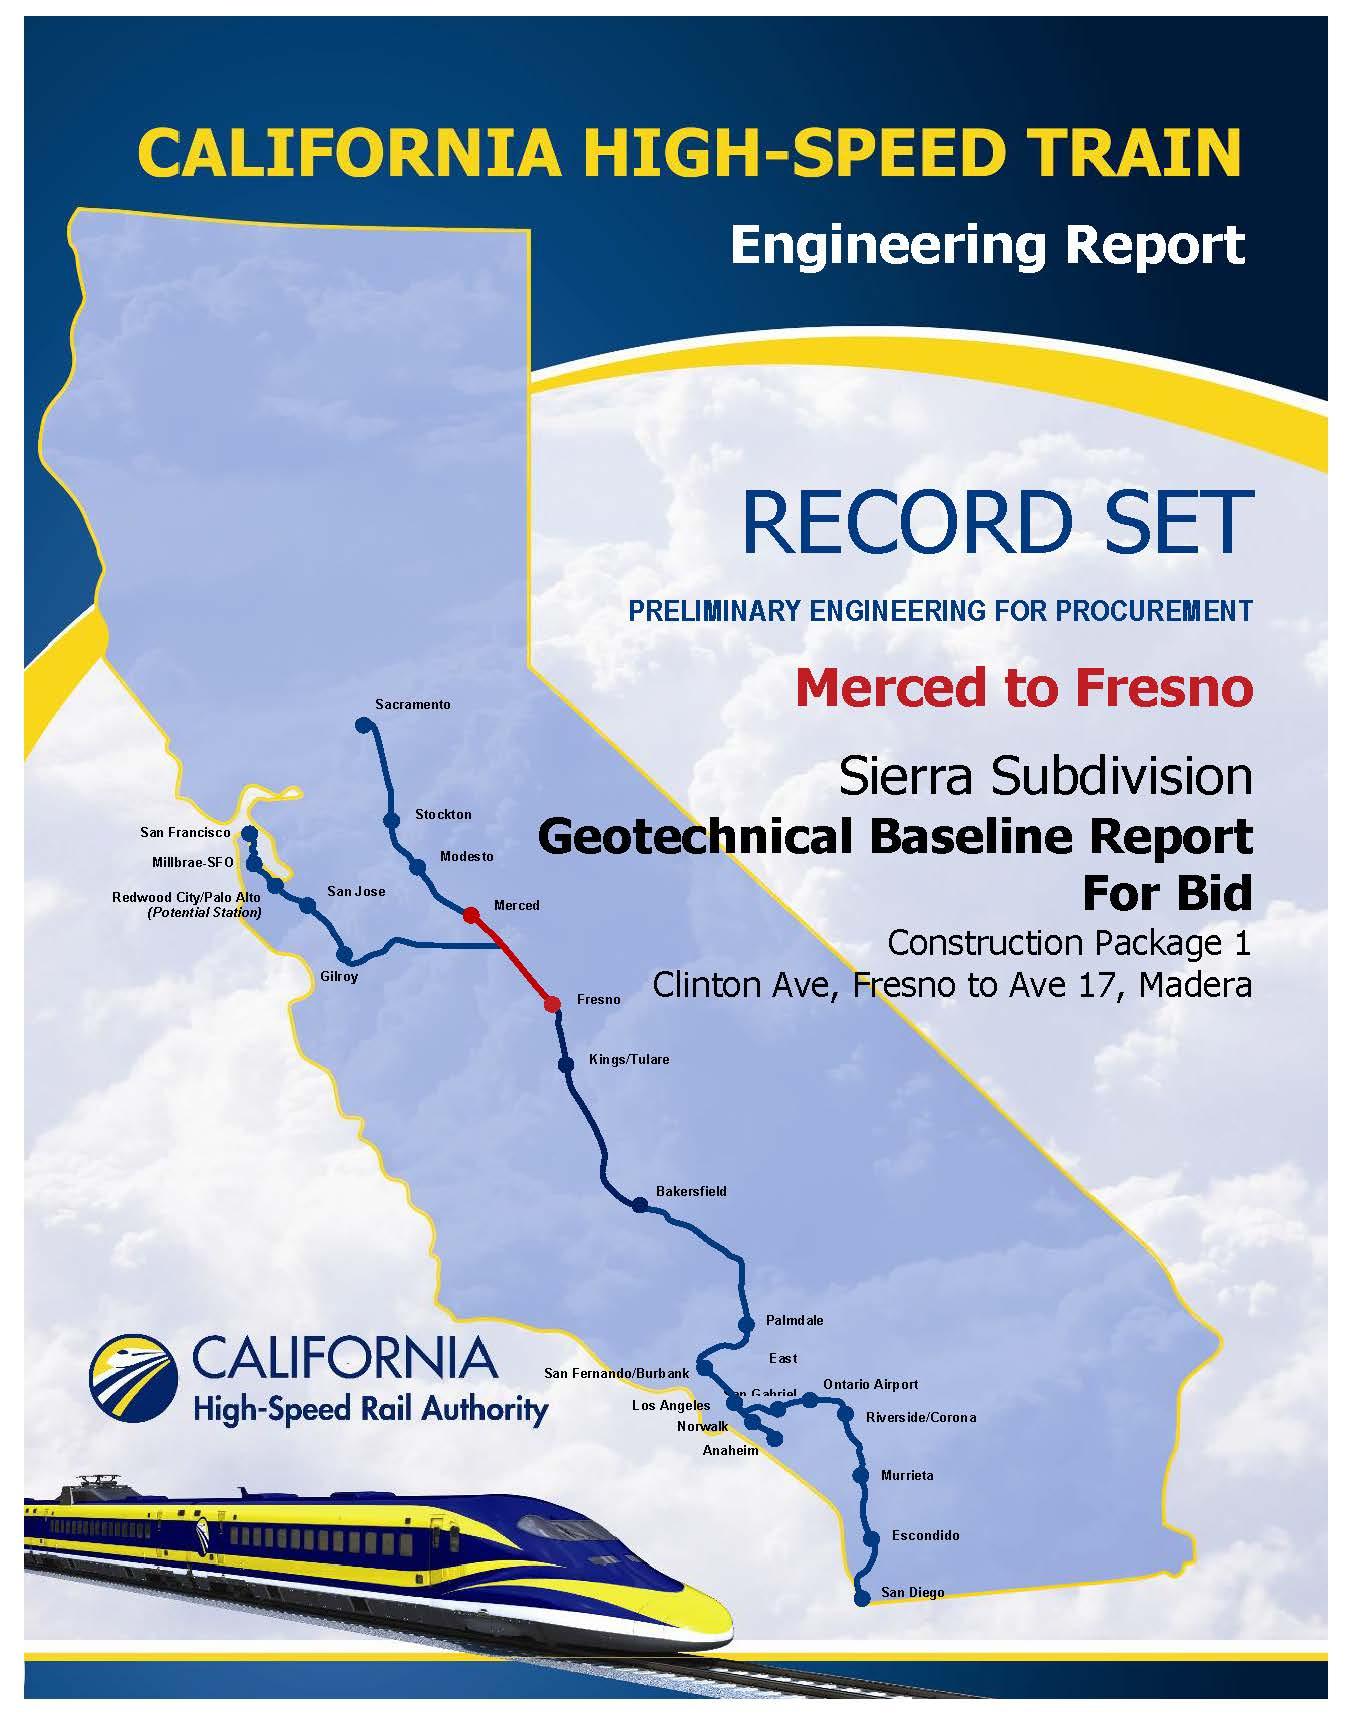 High Speed Rail California Map - Klipy - California High Speed Rail Project Map